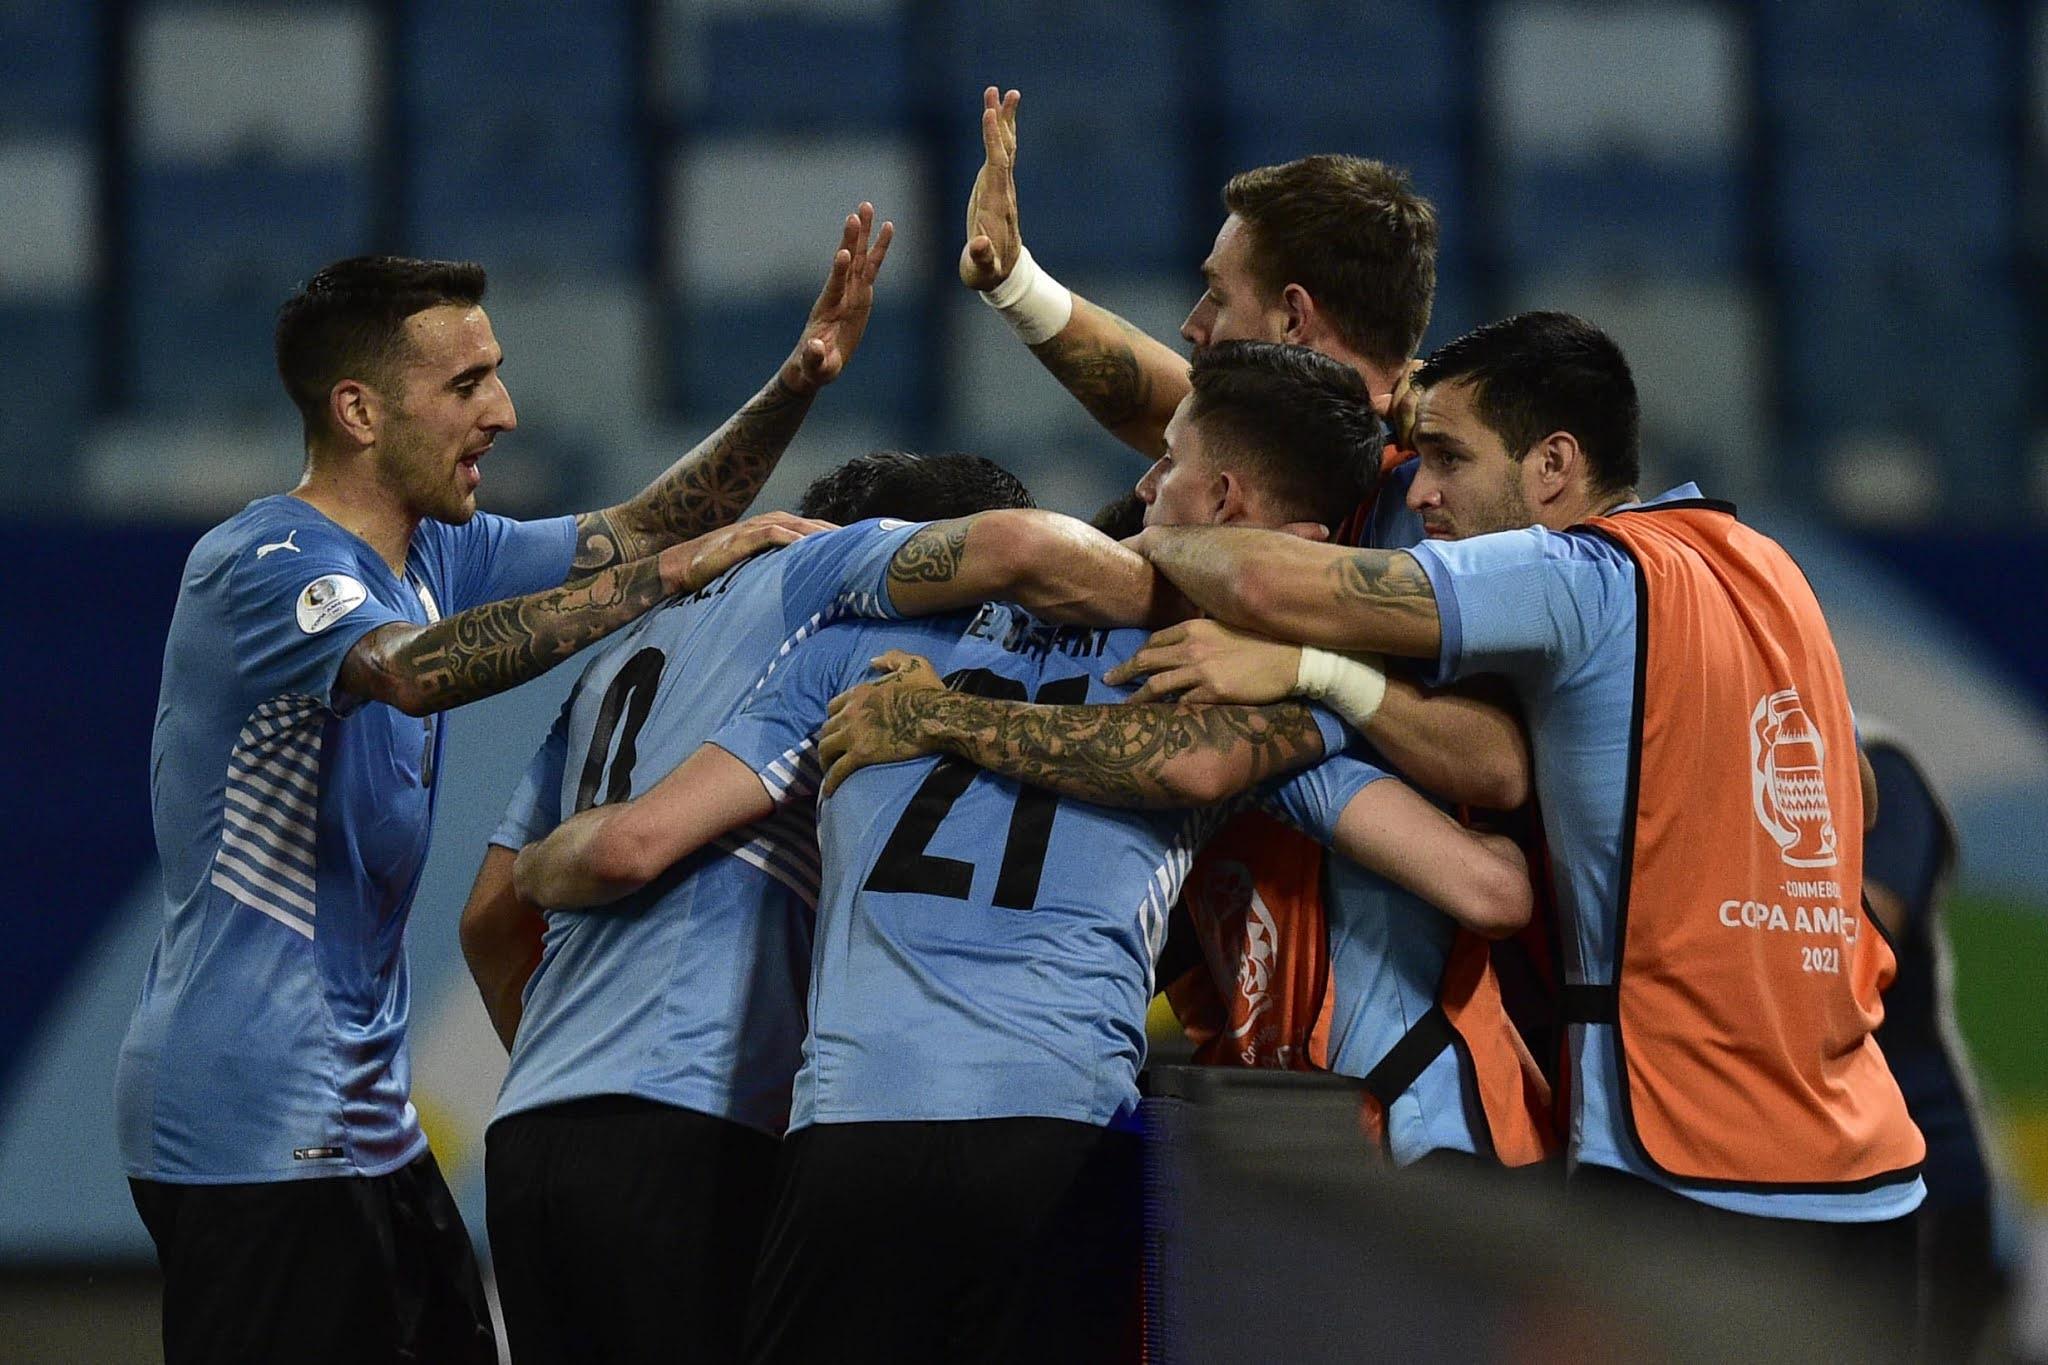 Uruguay clasificó a cuartos de final de la Copa América al superar a Bolivia